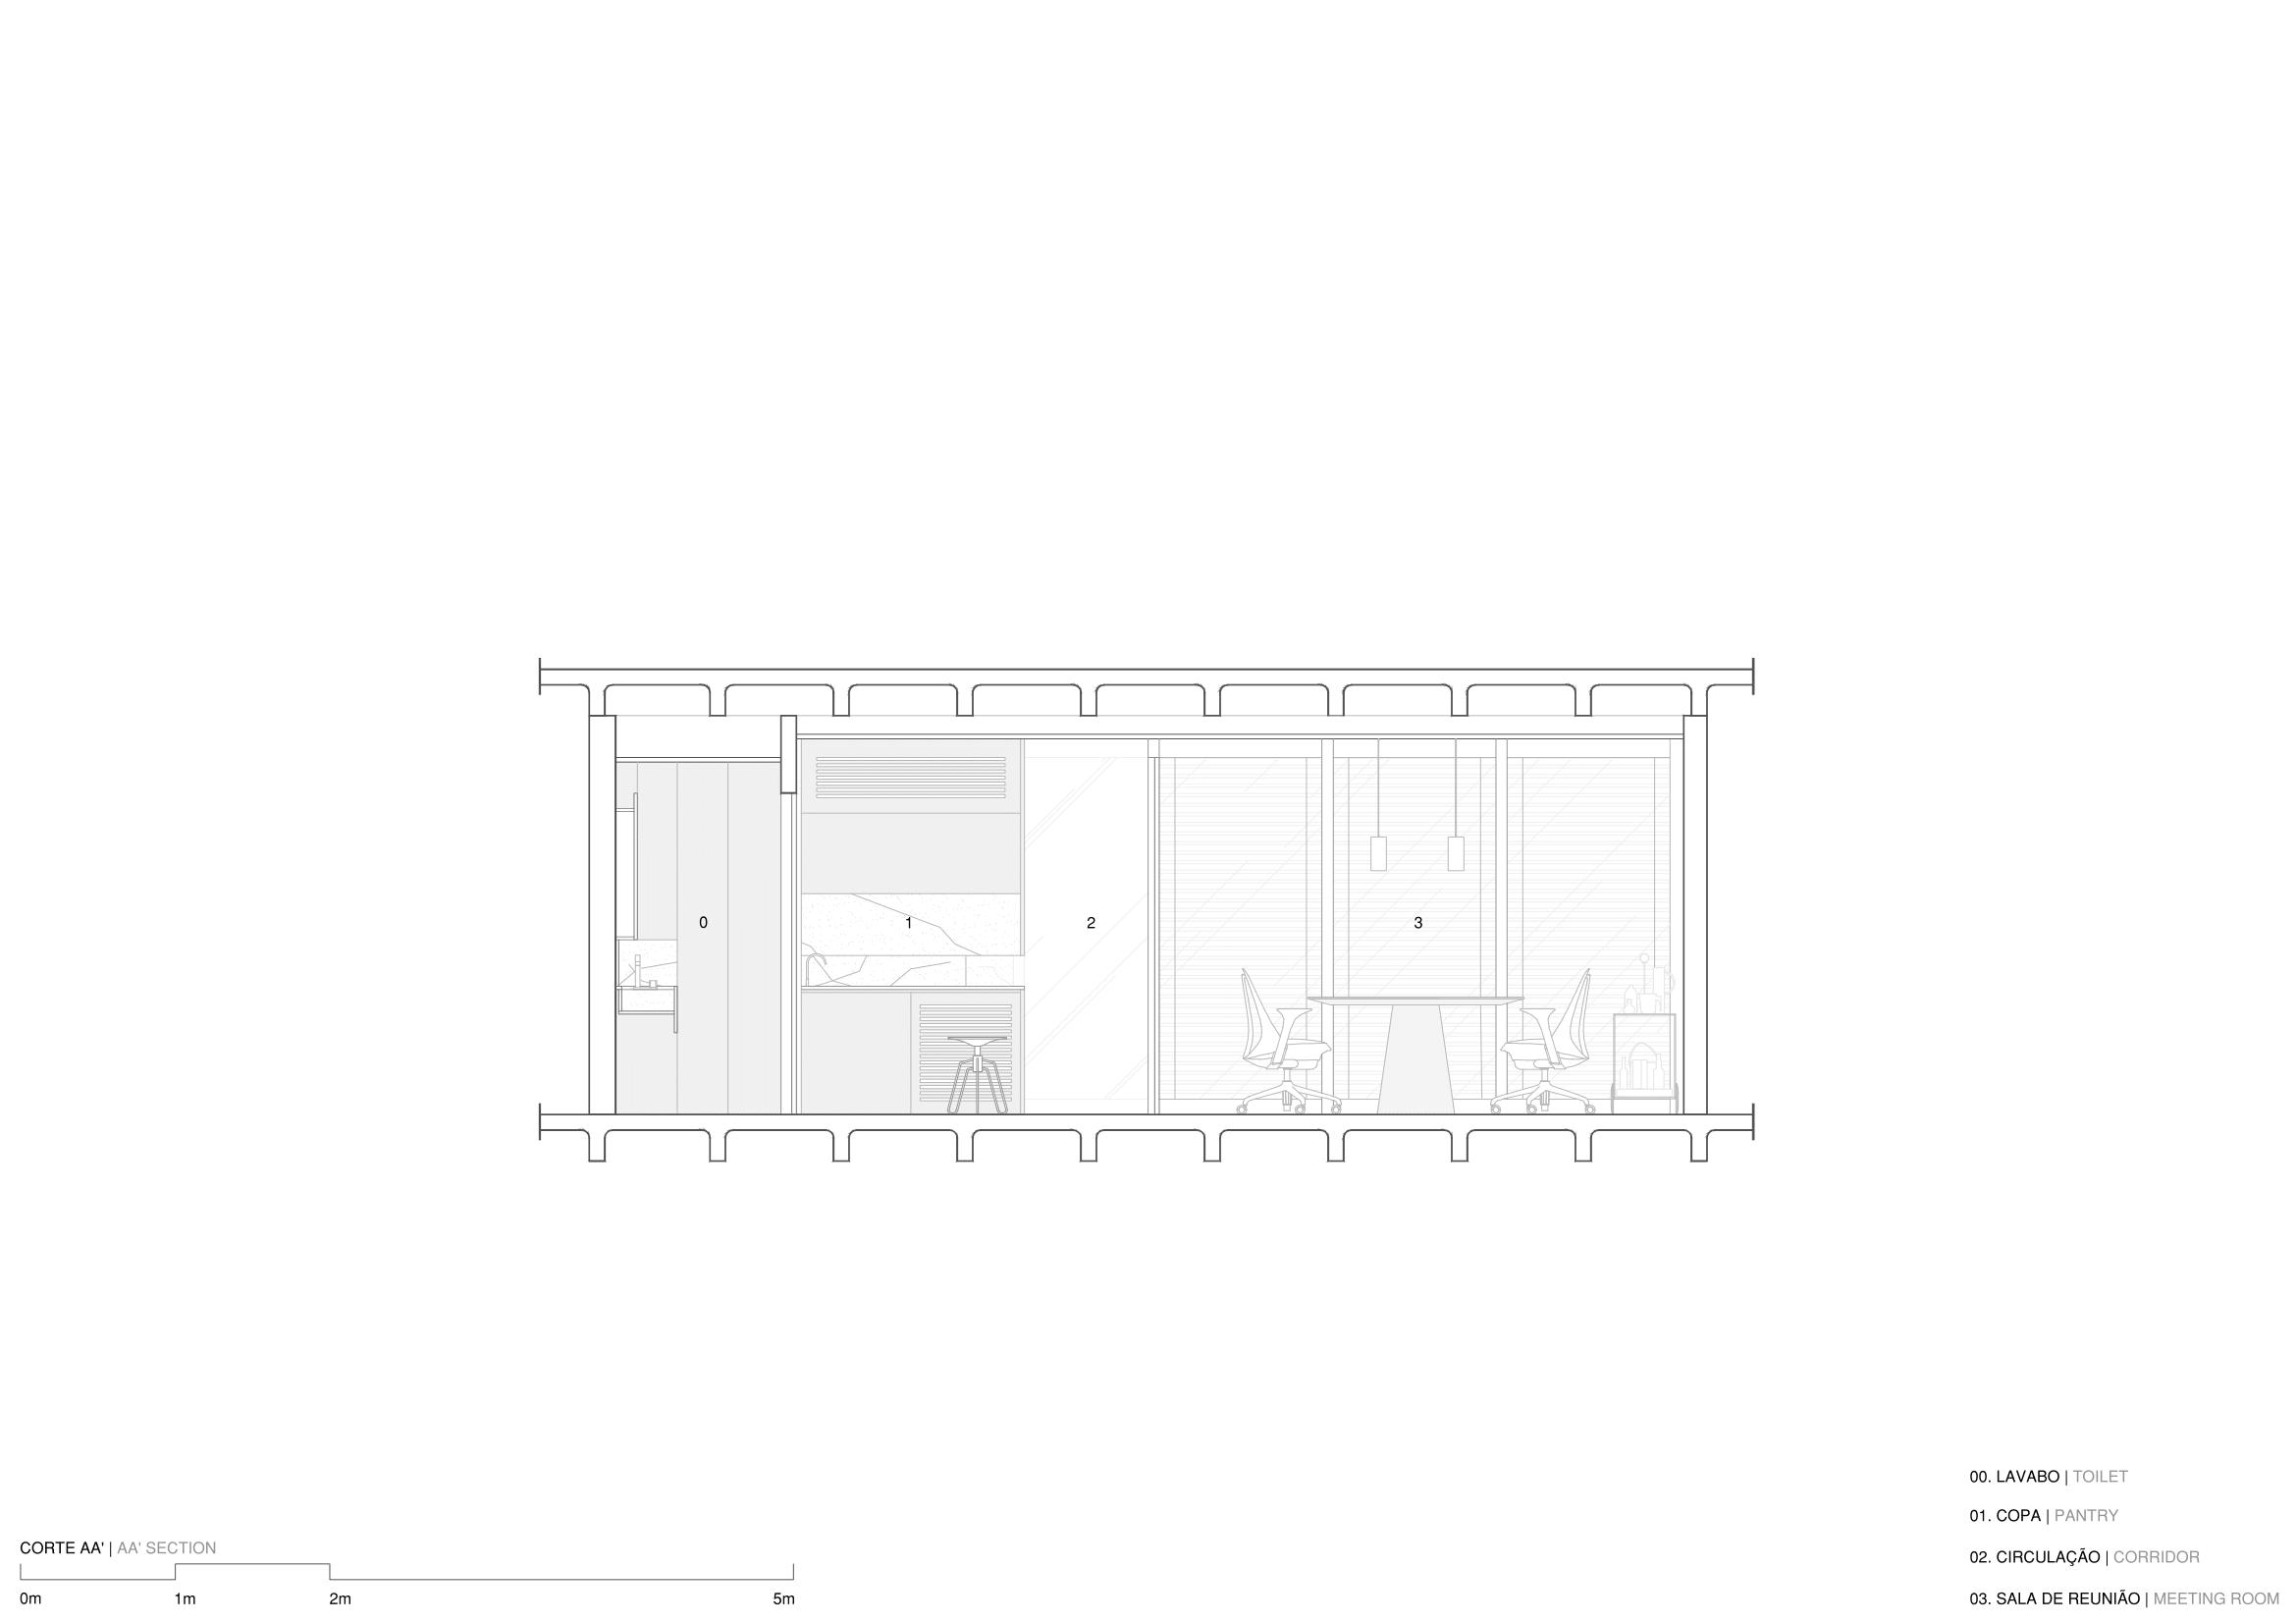 hobjeto-arquitetura-editora-zit-ap-02-corteaa